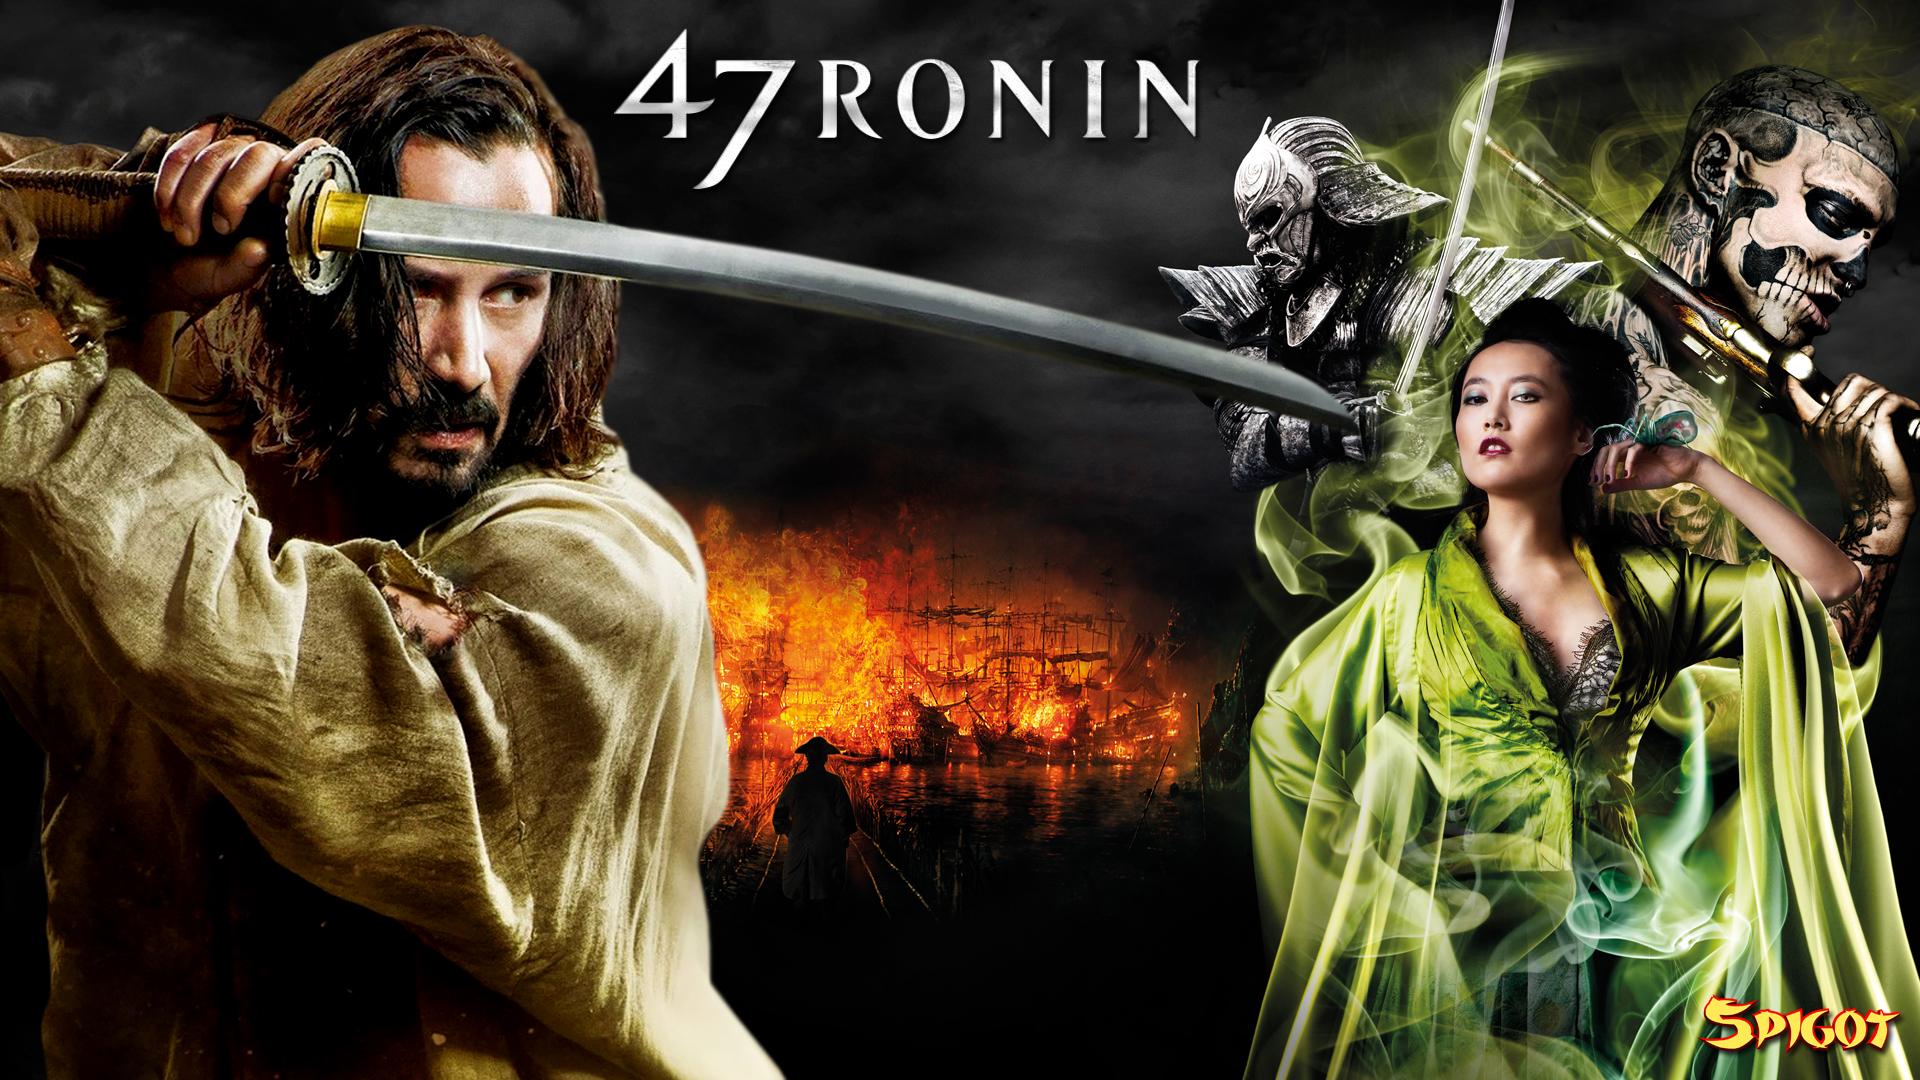 47 ronin movie watch online free in hindi